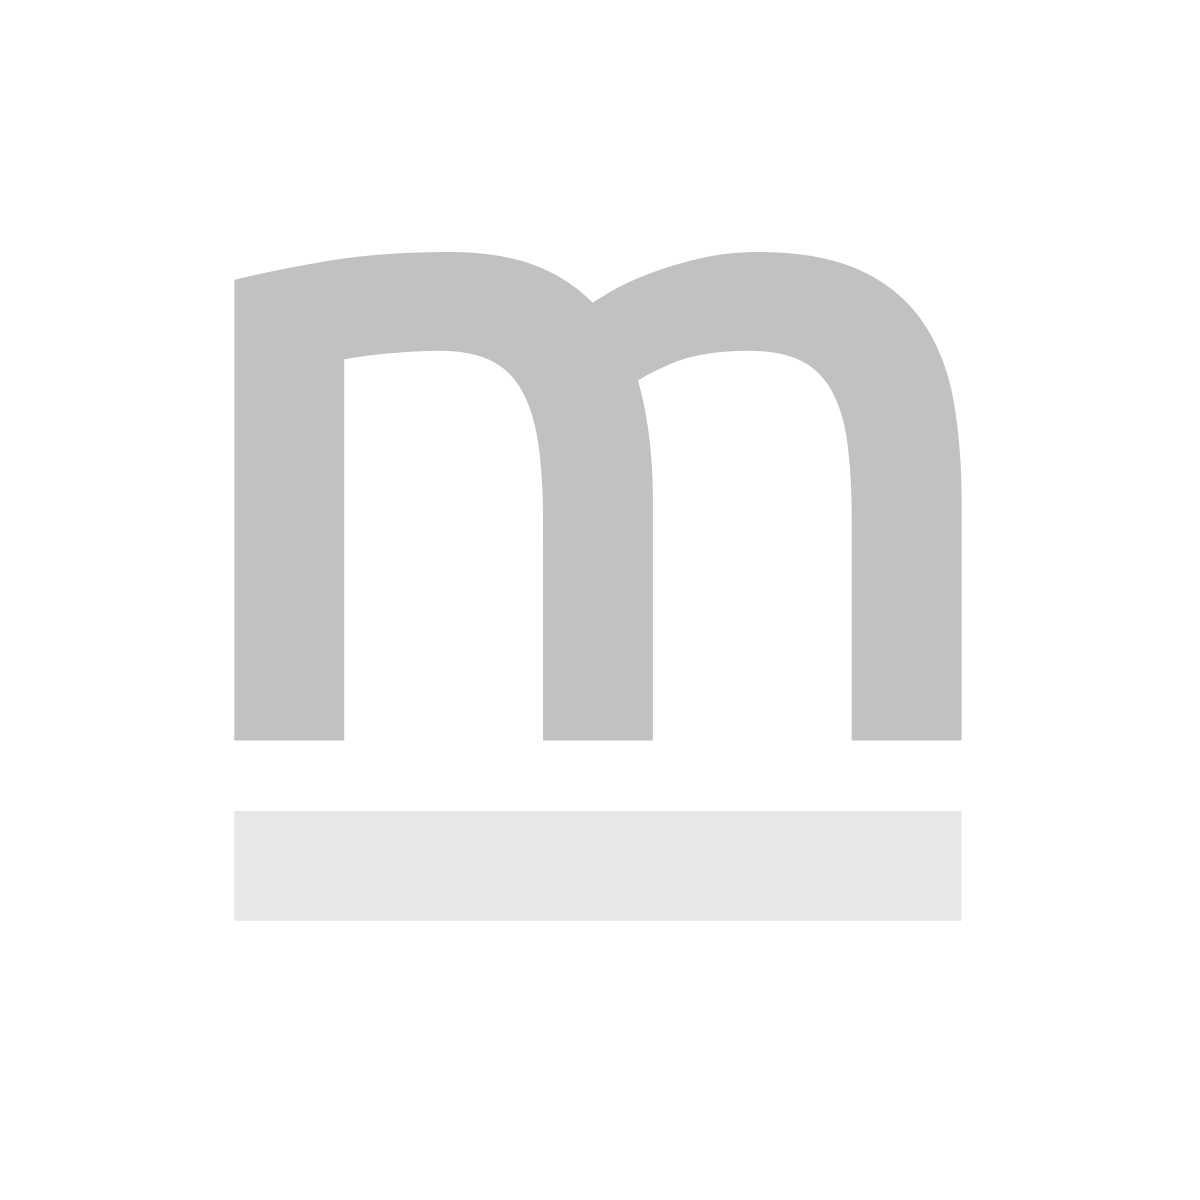 Lustro łazienkowe RUBINO CLOUD I 100